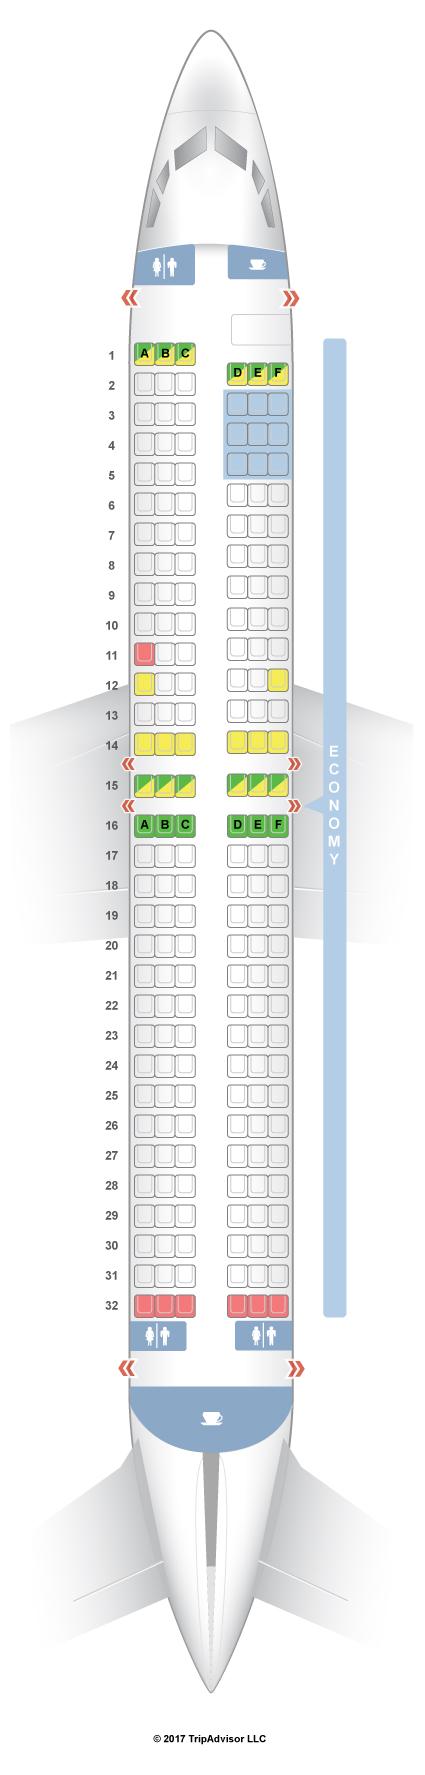 Seatguru Seat Map Tui Uk Seatguru